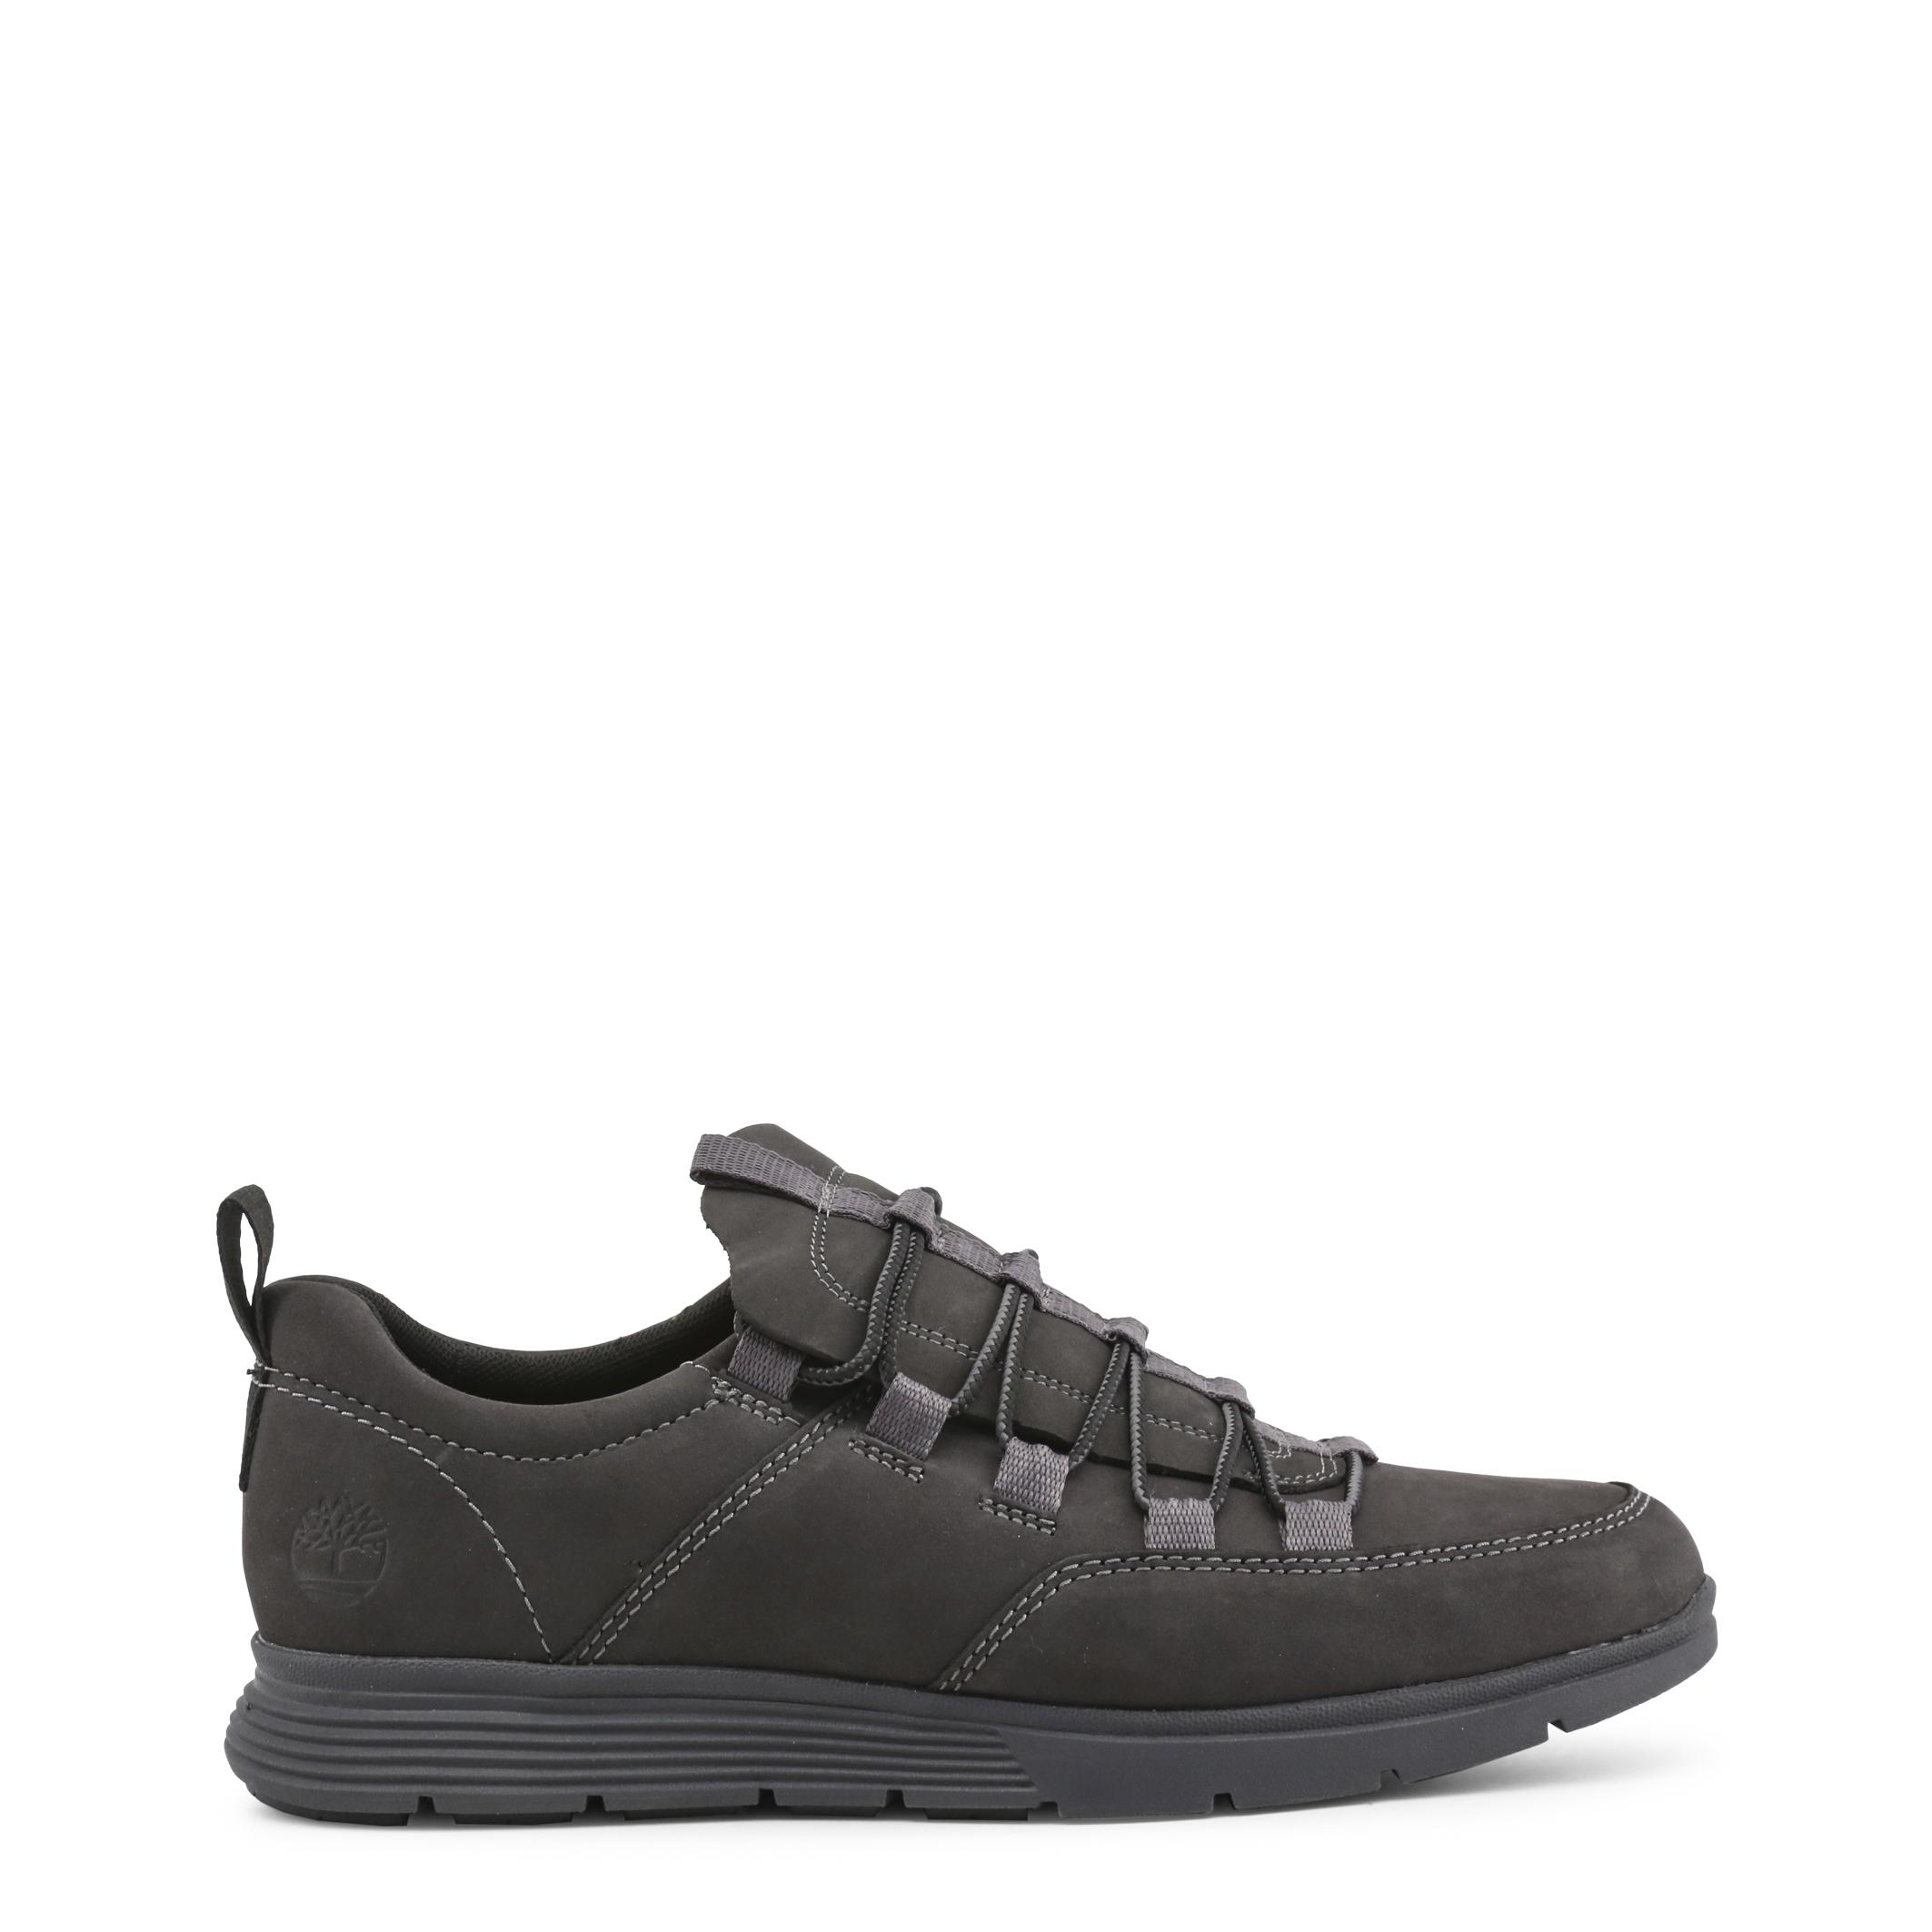 Sneakers-Timberland-KILLINGTON-TB0A1O-Uomo-Grigio-94751